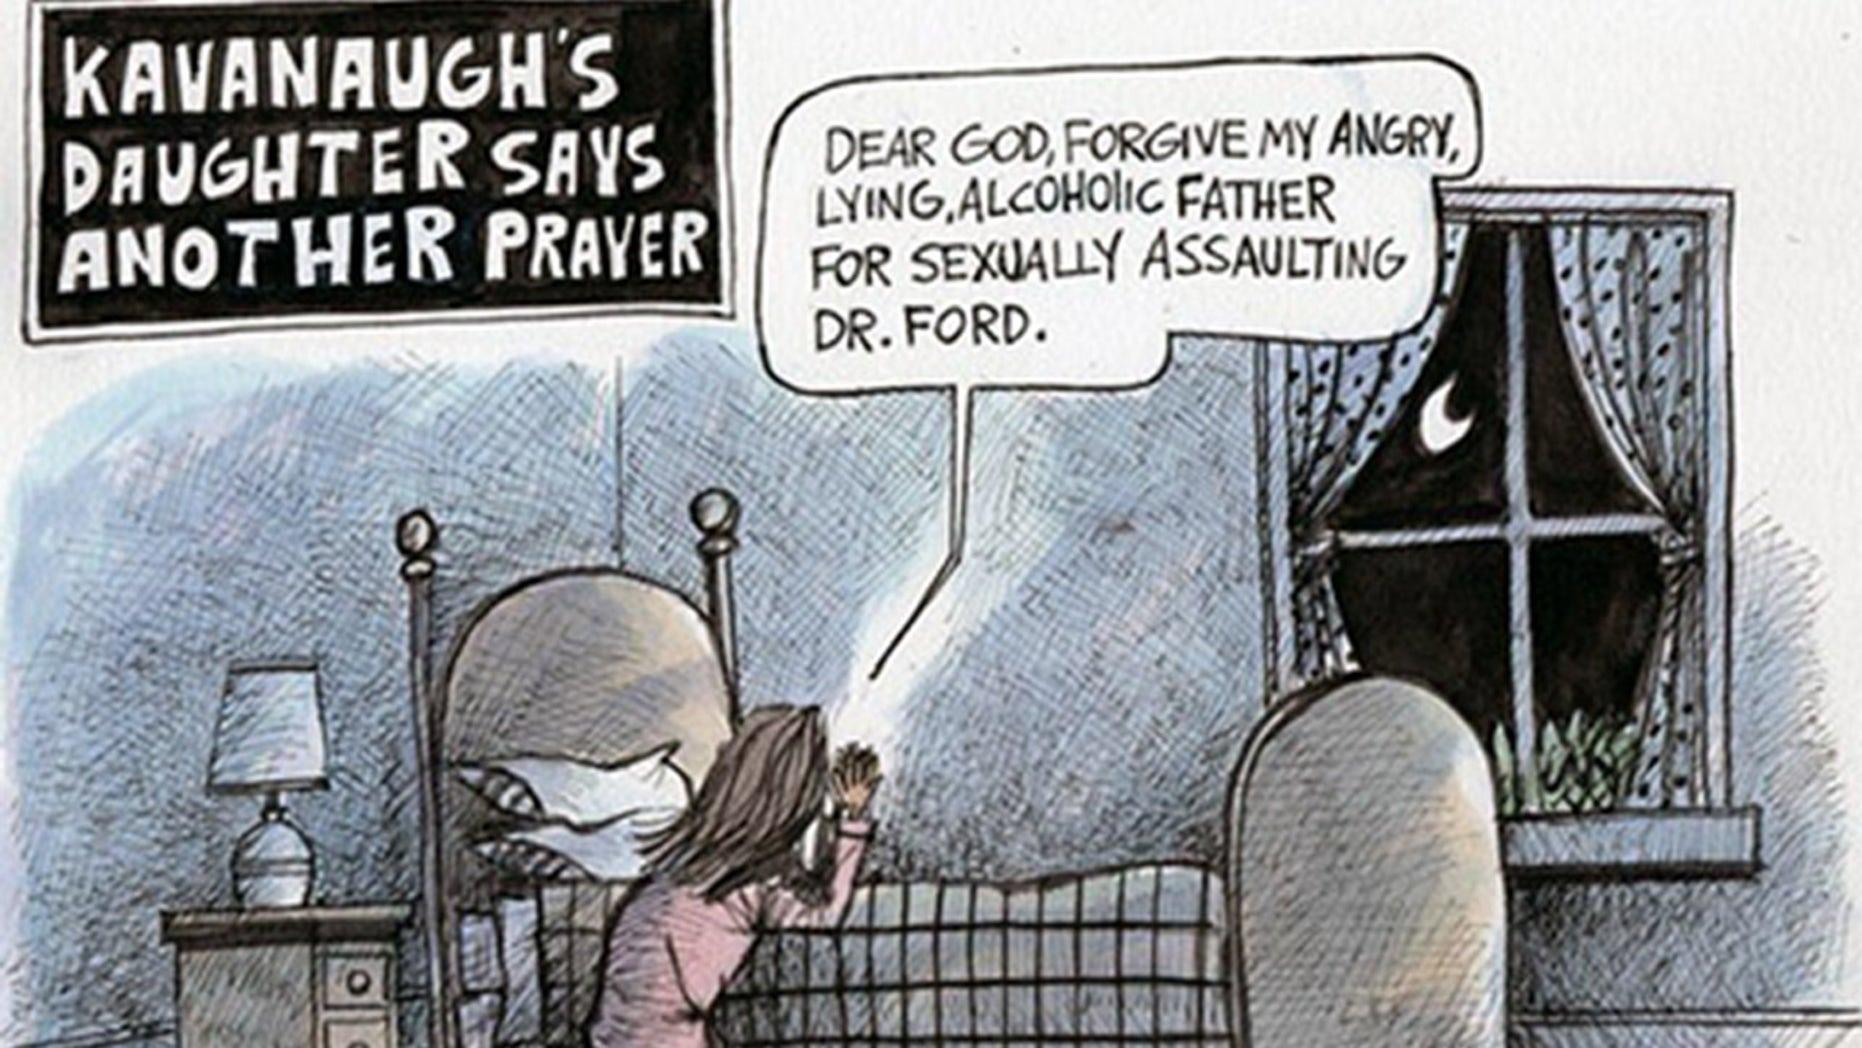 A controversial cartoon depicts Brett Kavanaugh's daughter, Liza, saying her prayers.